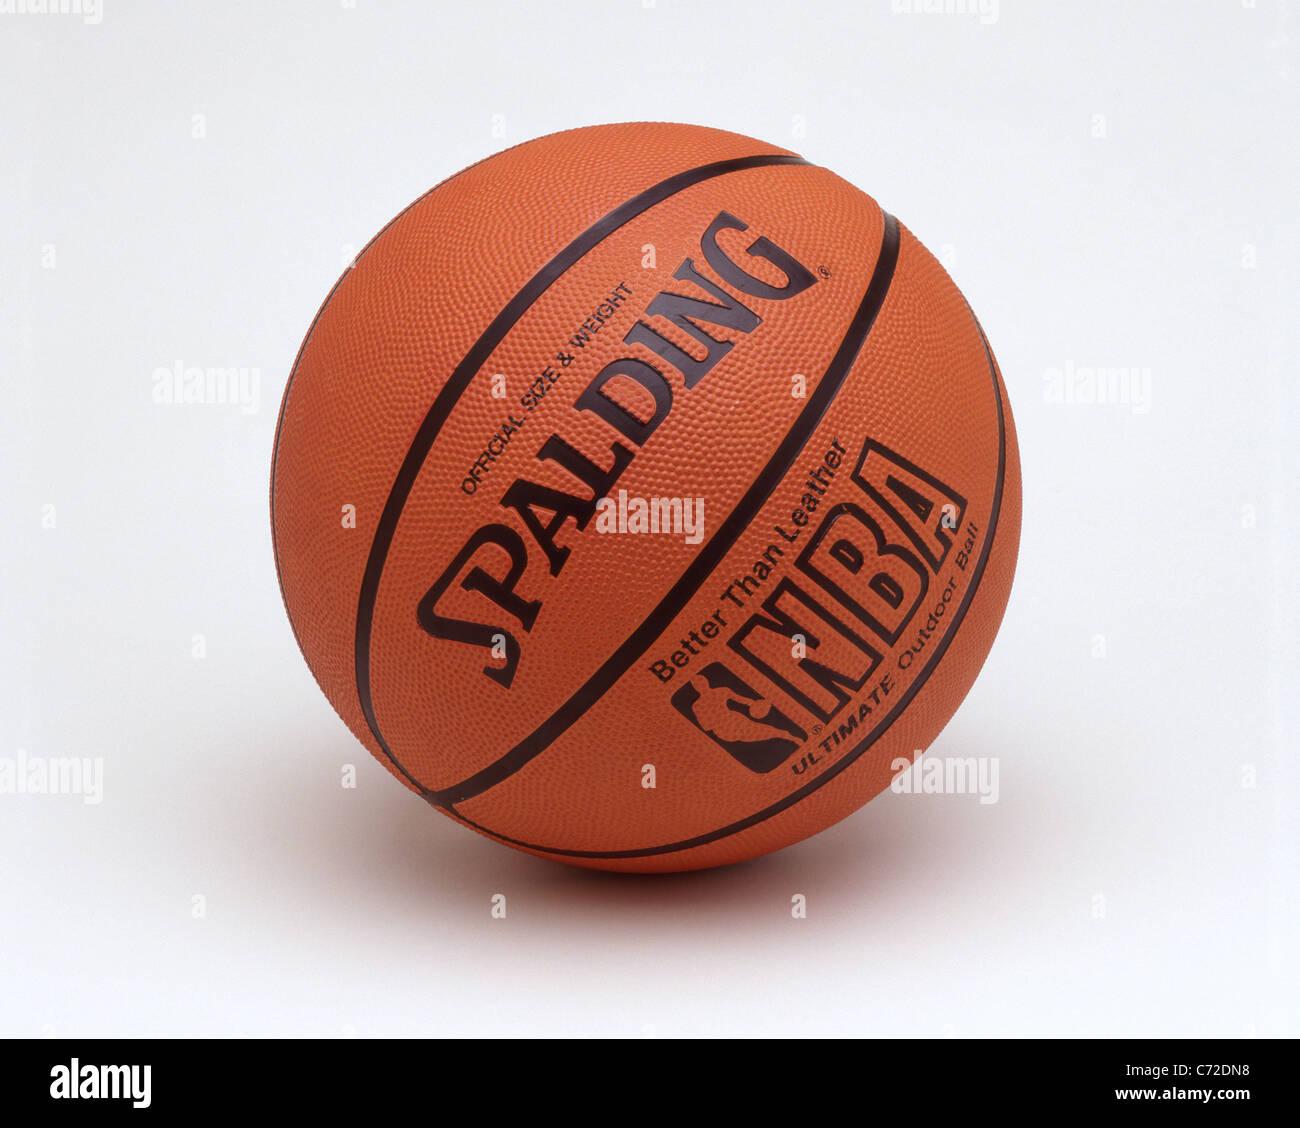 NBA basketball, Los Angeles, California, United States of America - Stock Image